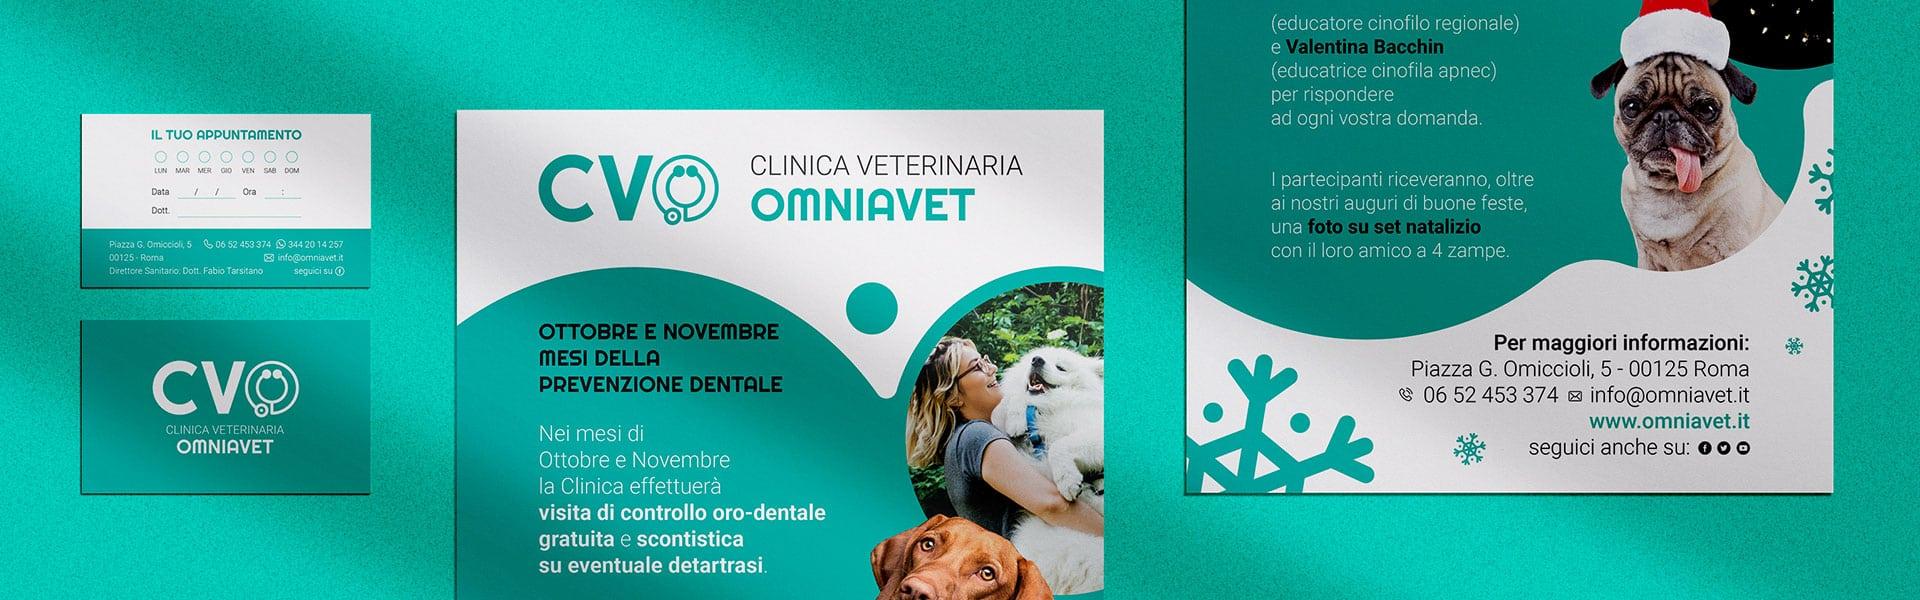 Omniavet - Brand Identity 1